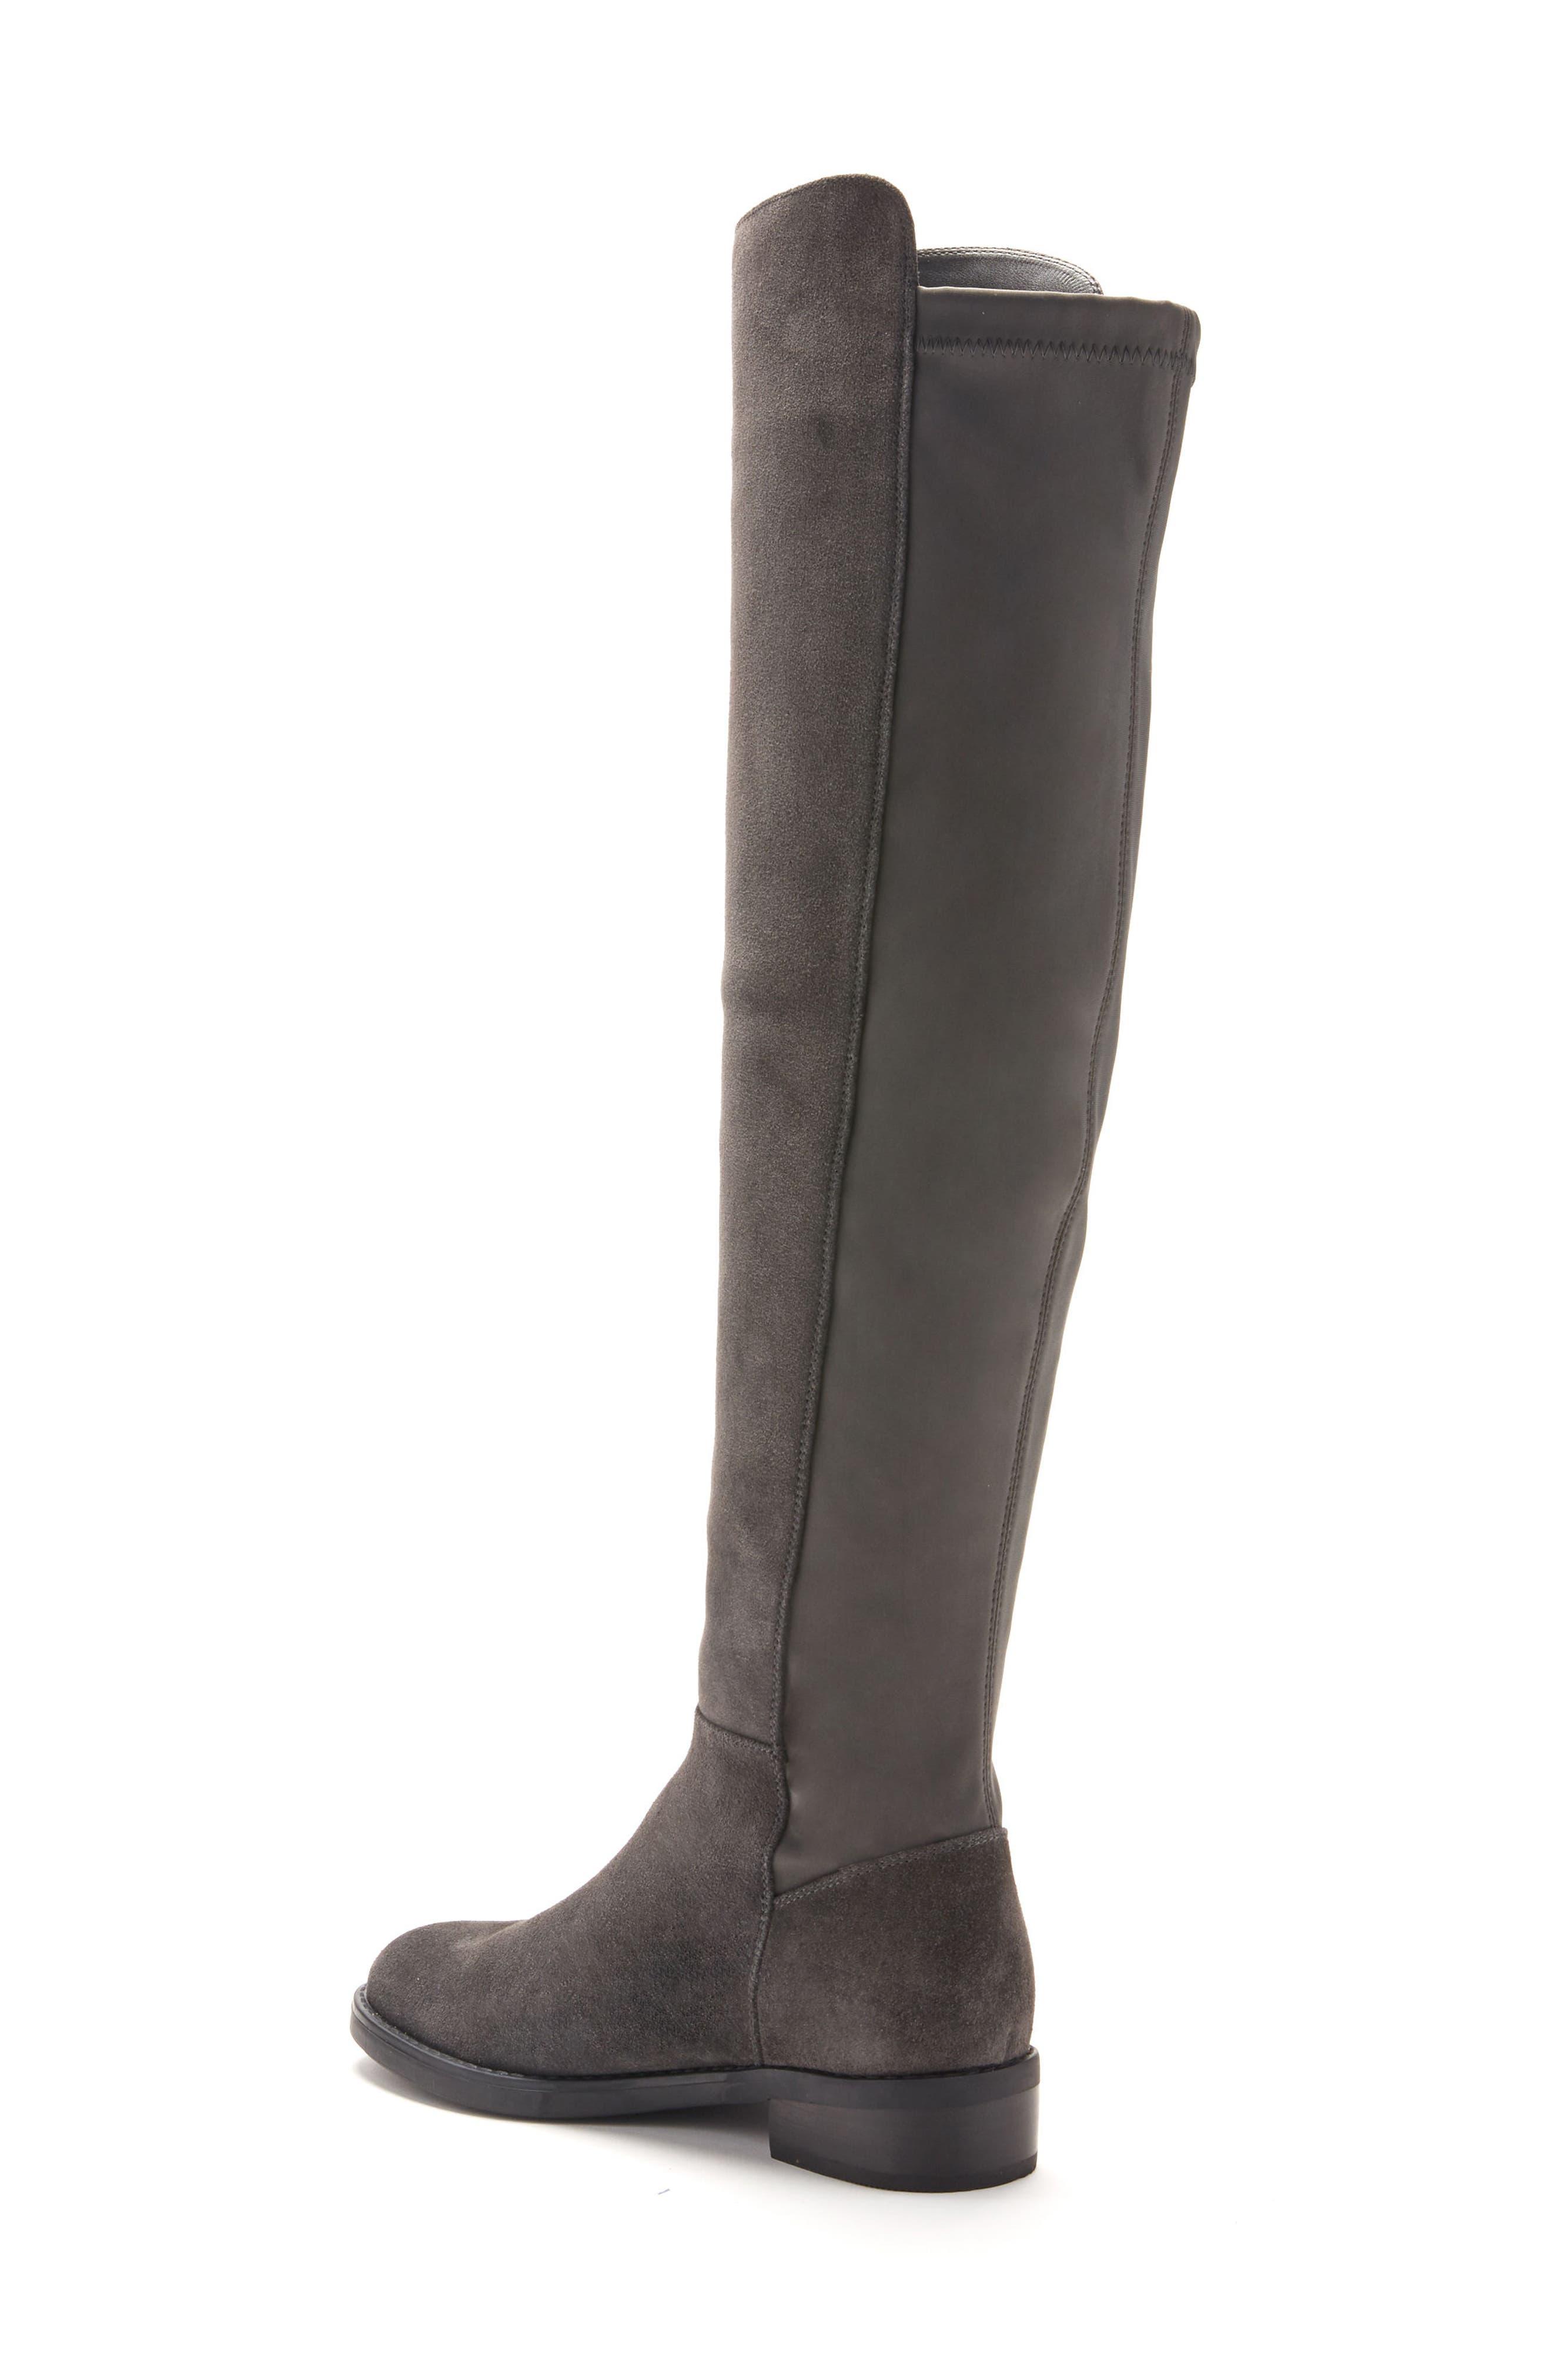 Olivia Knee High Boot,                             Alternate thumbnail 6, color,